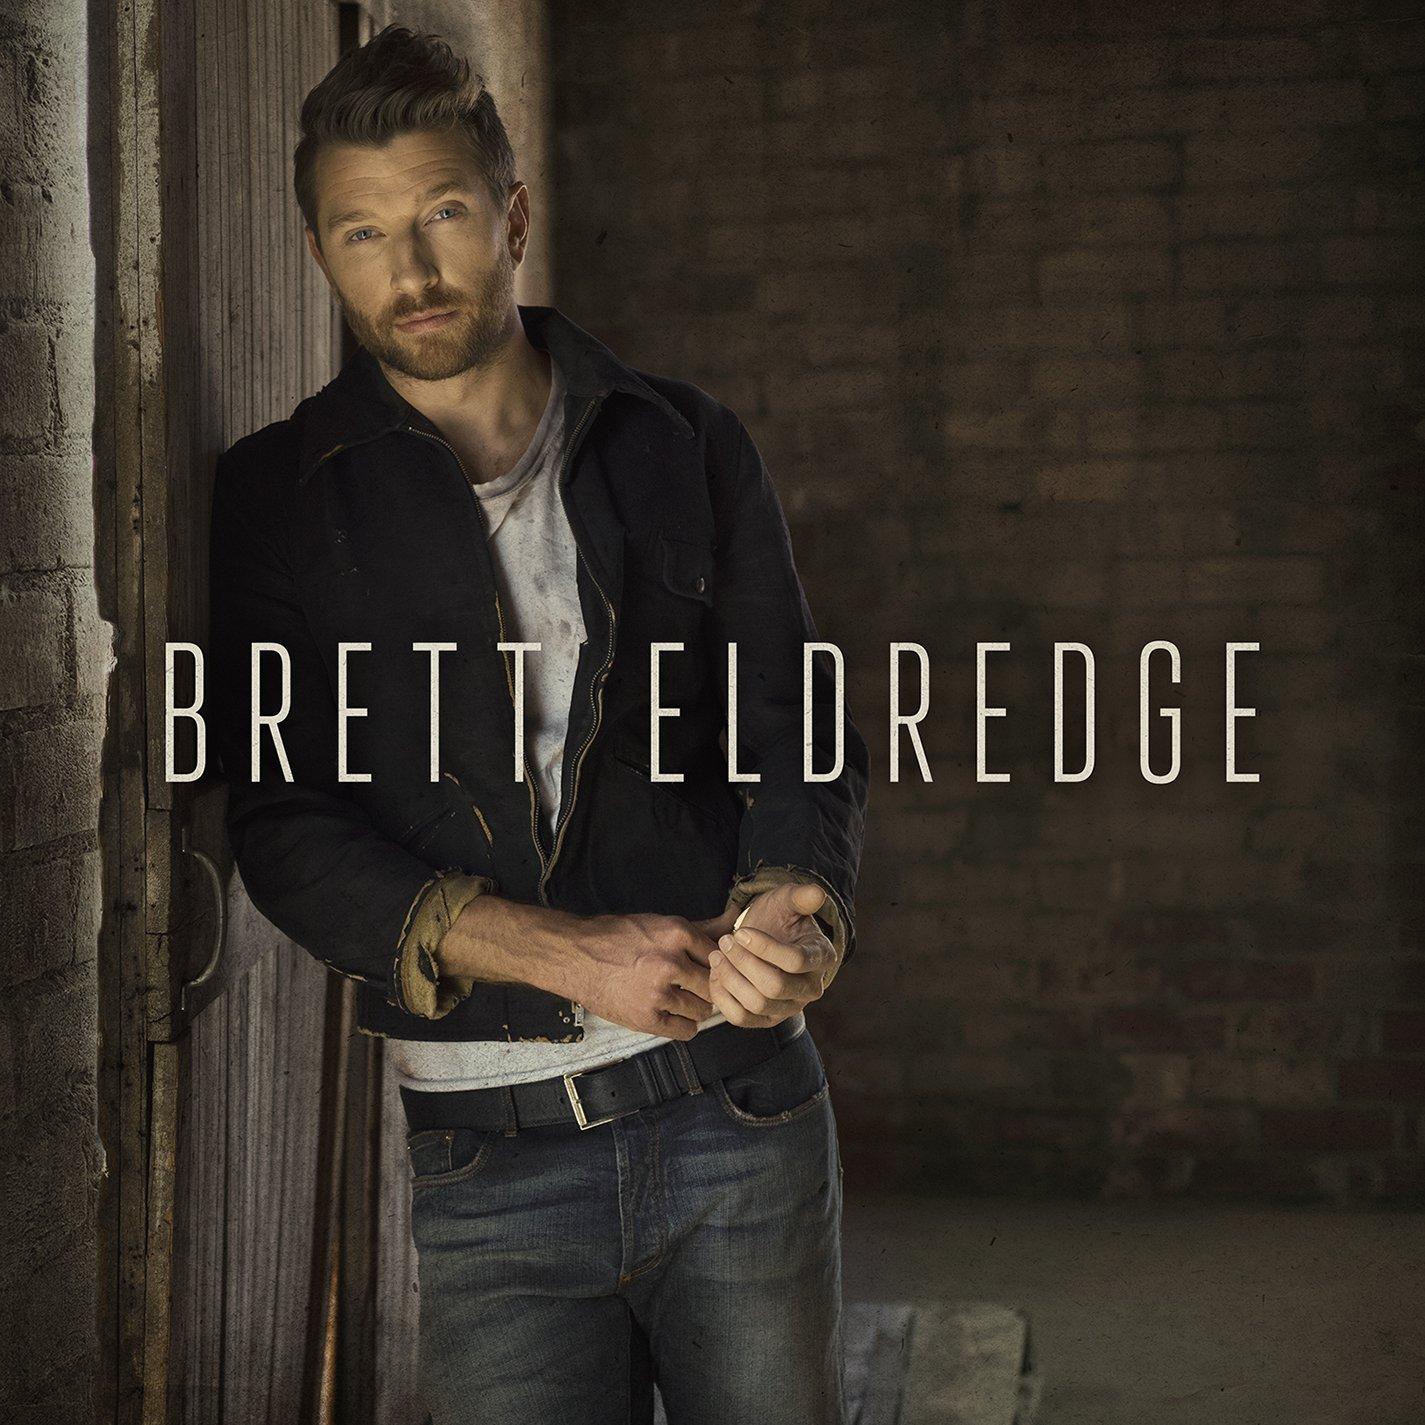 Brett Eldredge, 'Somethin' I'm Good At' | Track Review